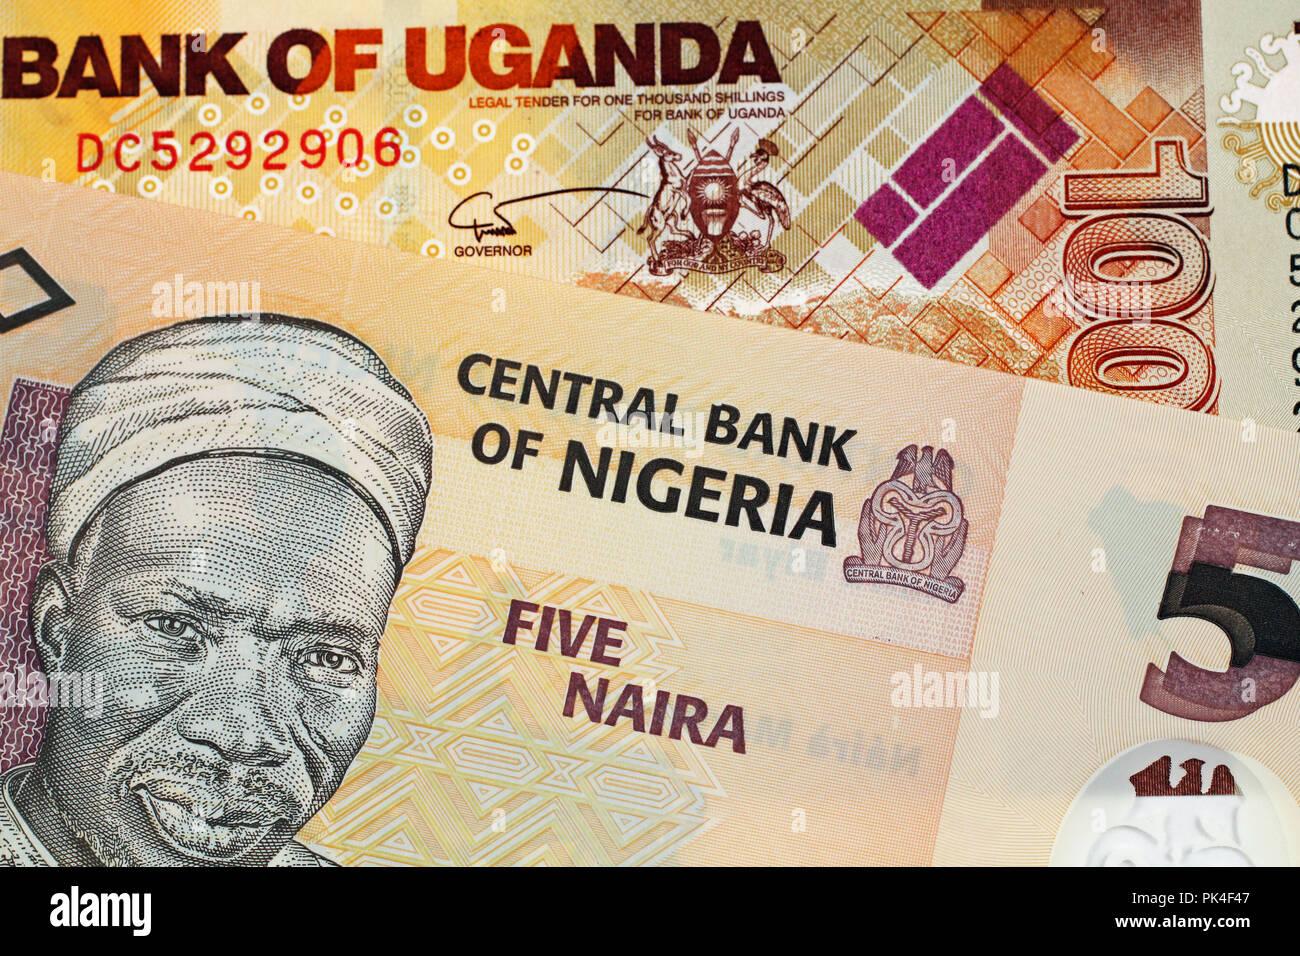 A close up image of a five Nigerian Naira banknote and a thousand Ugandan shilling bill - Stock Image